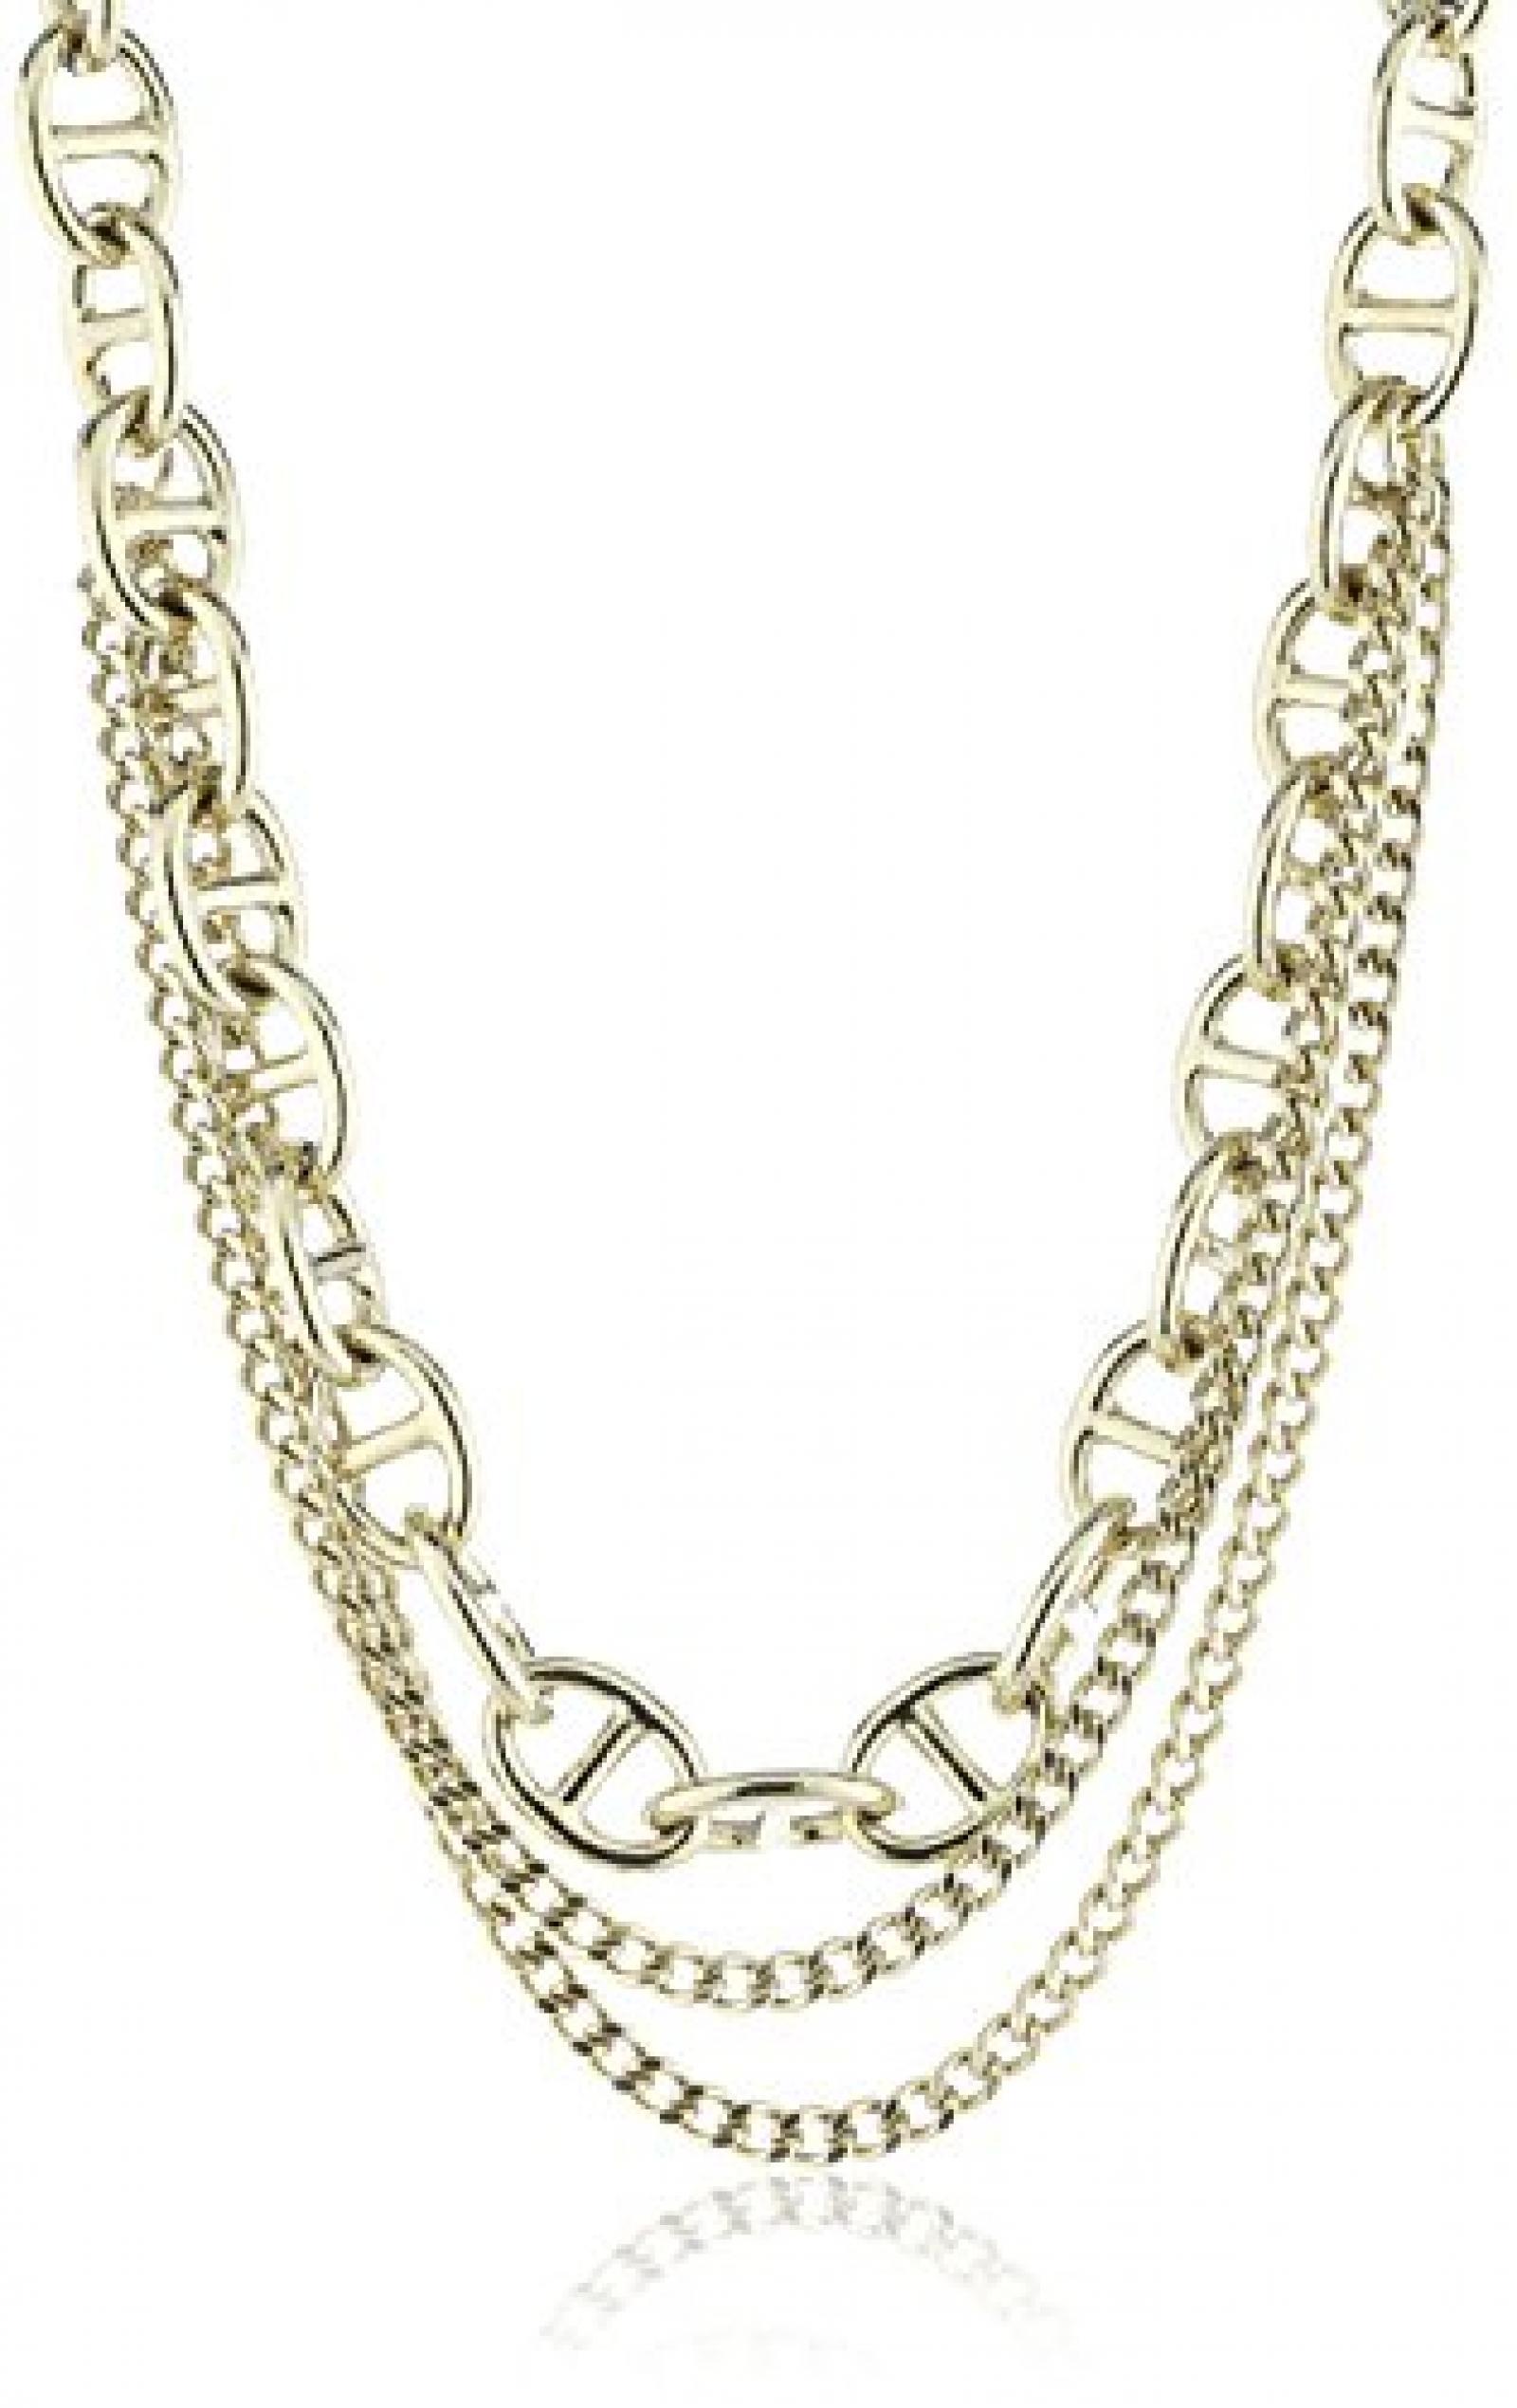 Dyrberg/Kern Damen Halskette Vergoldetes Metall Swarovski-Kristall 336242